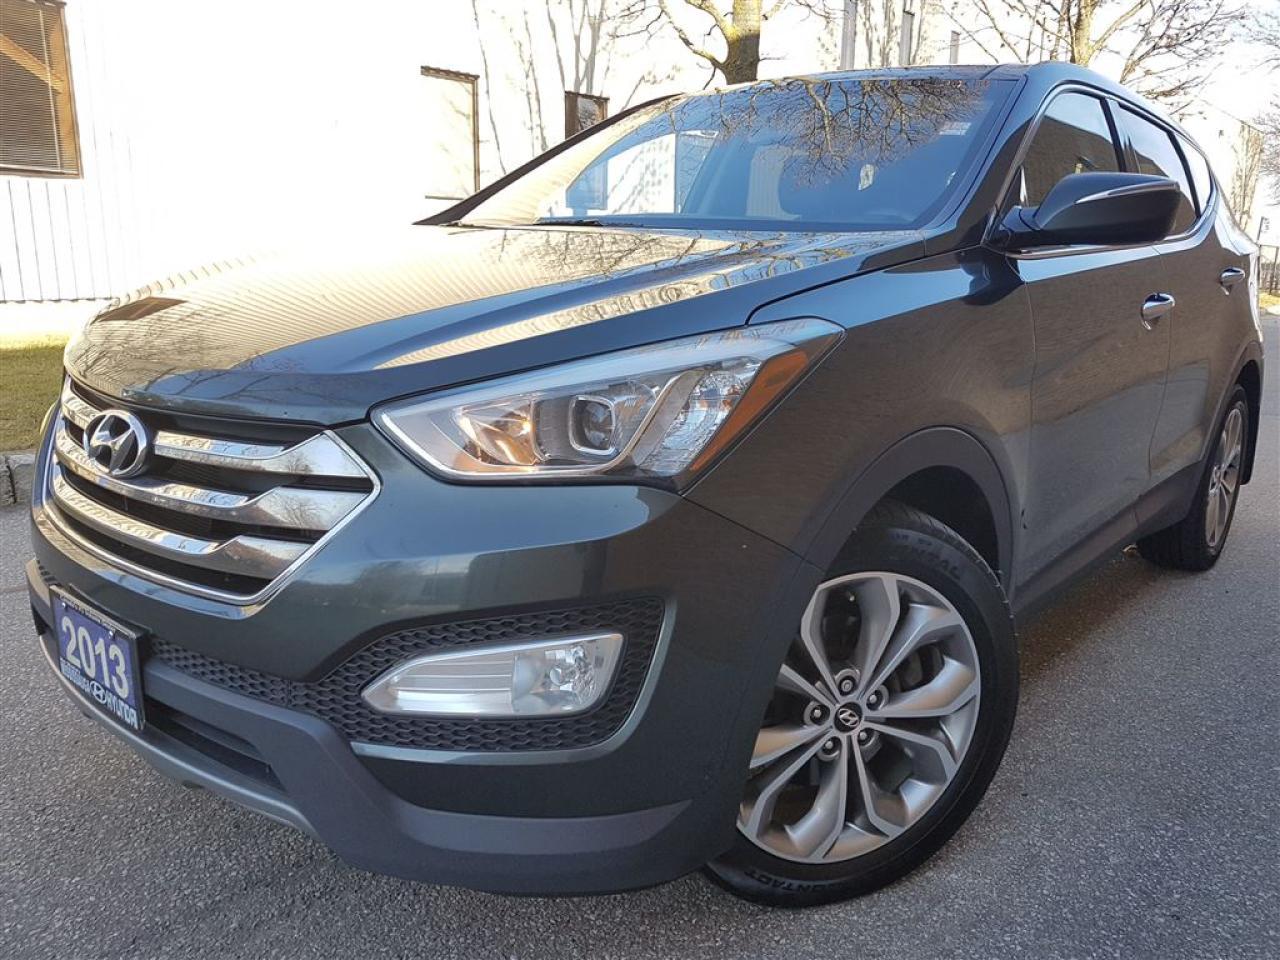 2013 Hyundai Santa Fe Sport 2.0T Limited-Navi-Excellent maintenence records!